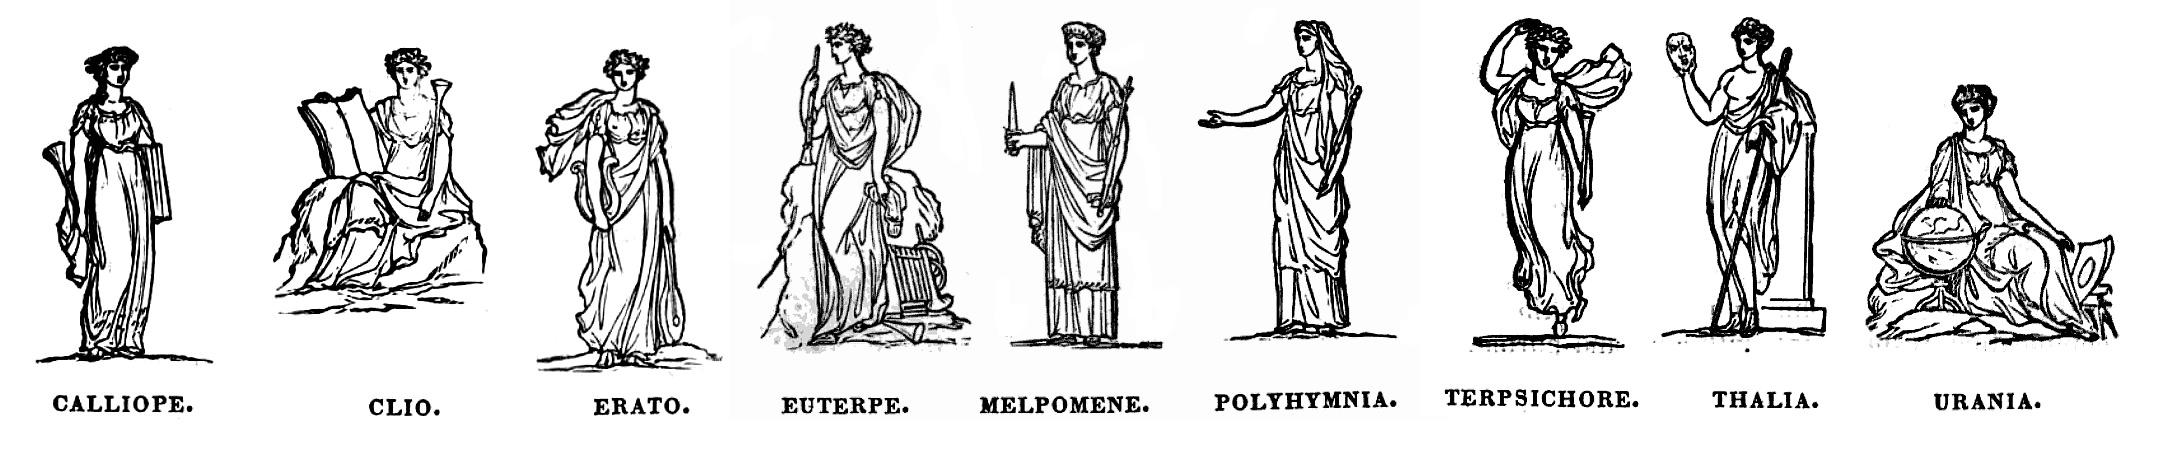 Nine Muses - Samuel Griswold Goodrich (1832)